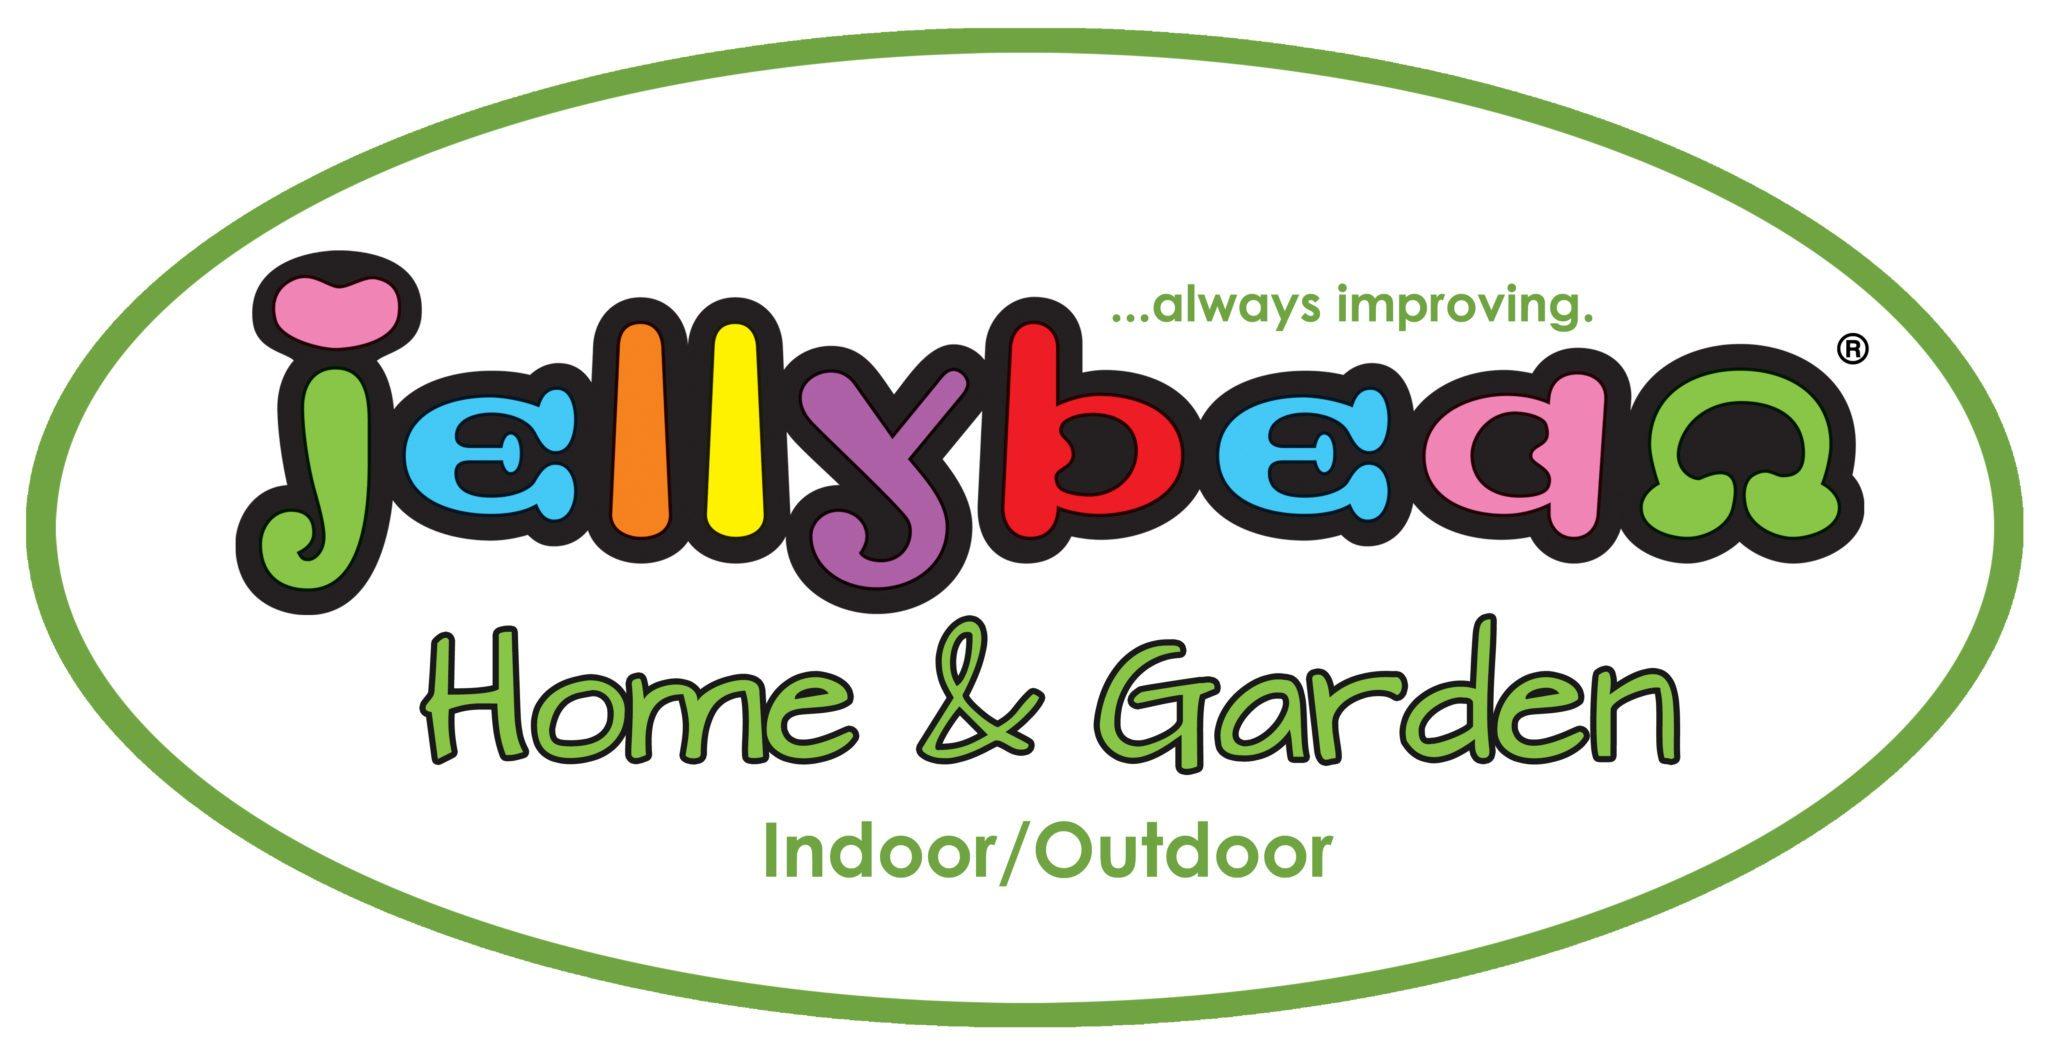 Jellybean rugs gift shop tyler texas